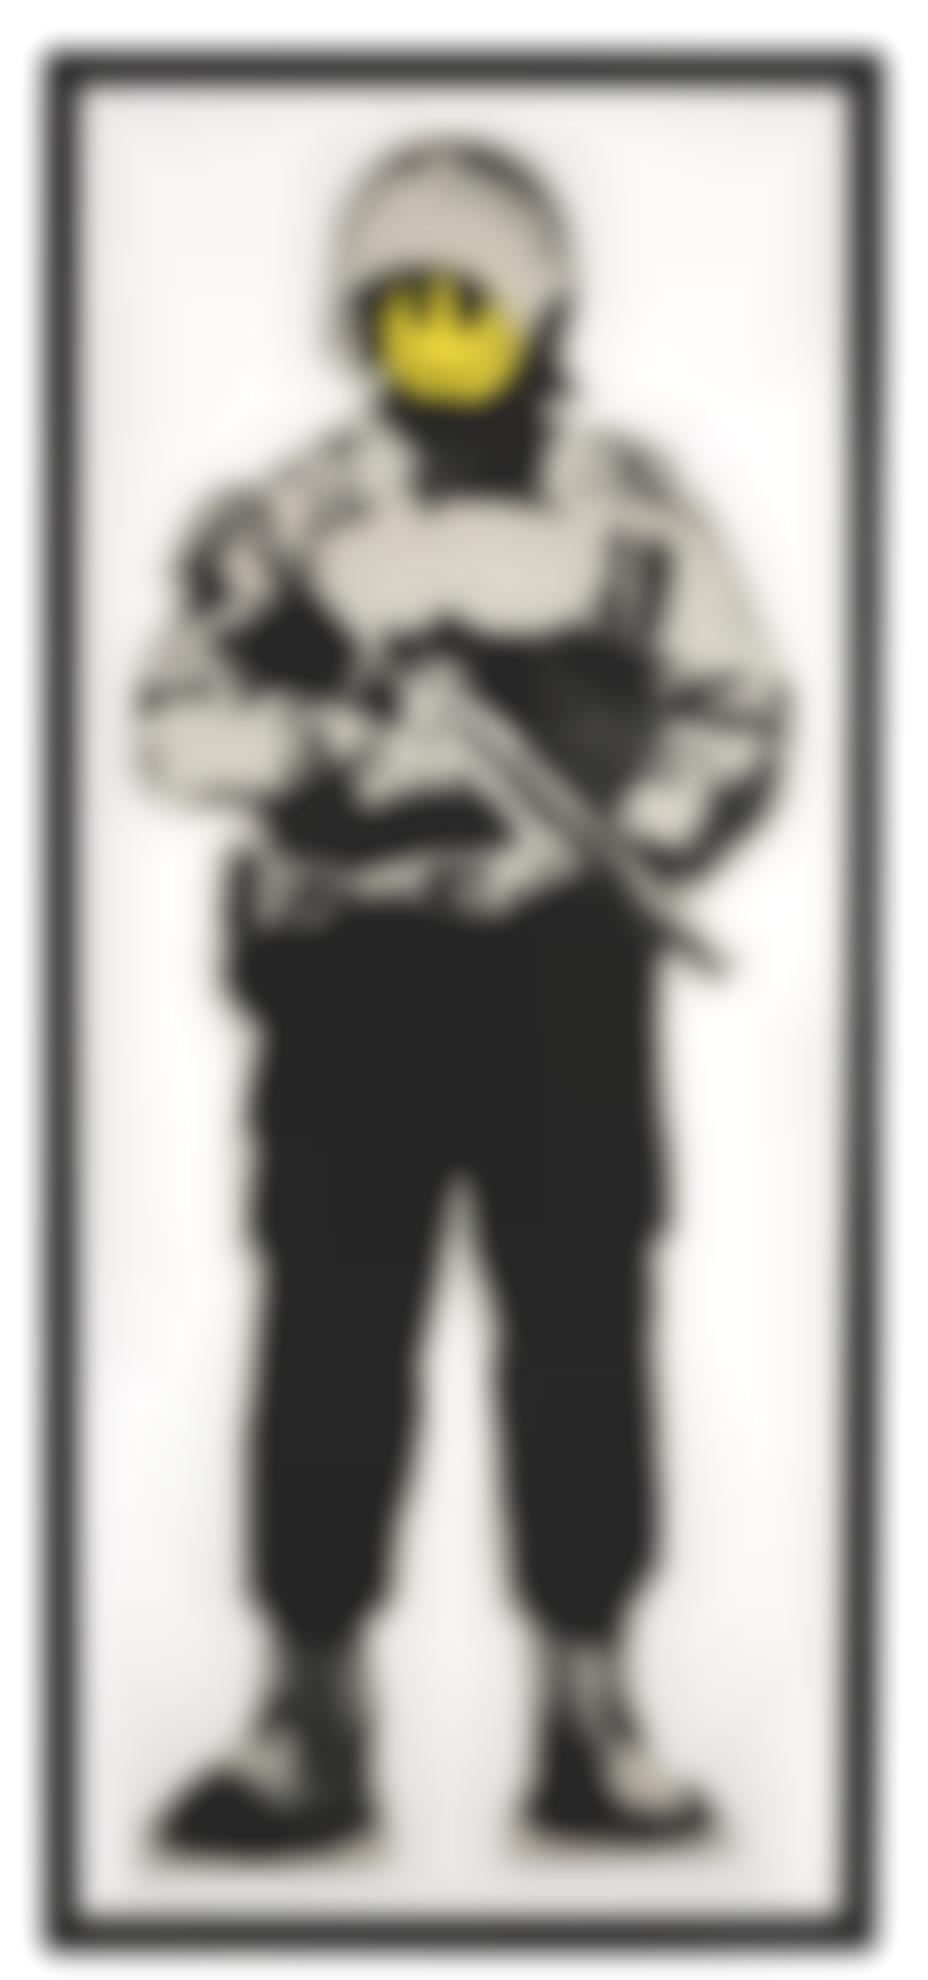 Banksy-Smiling Copper-2003